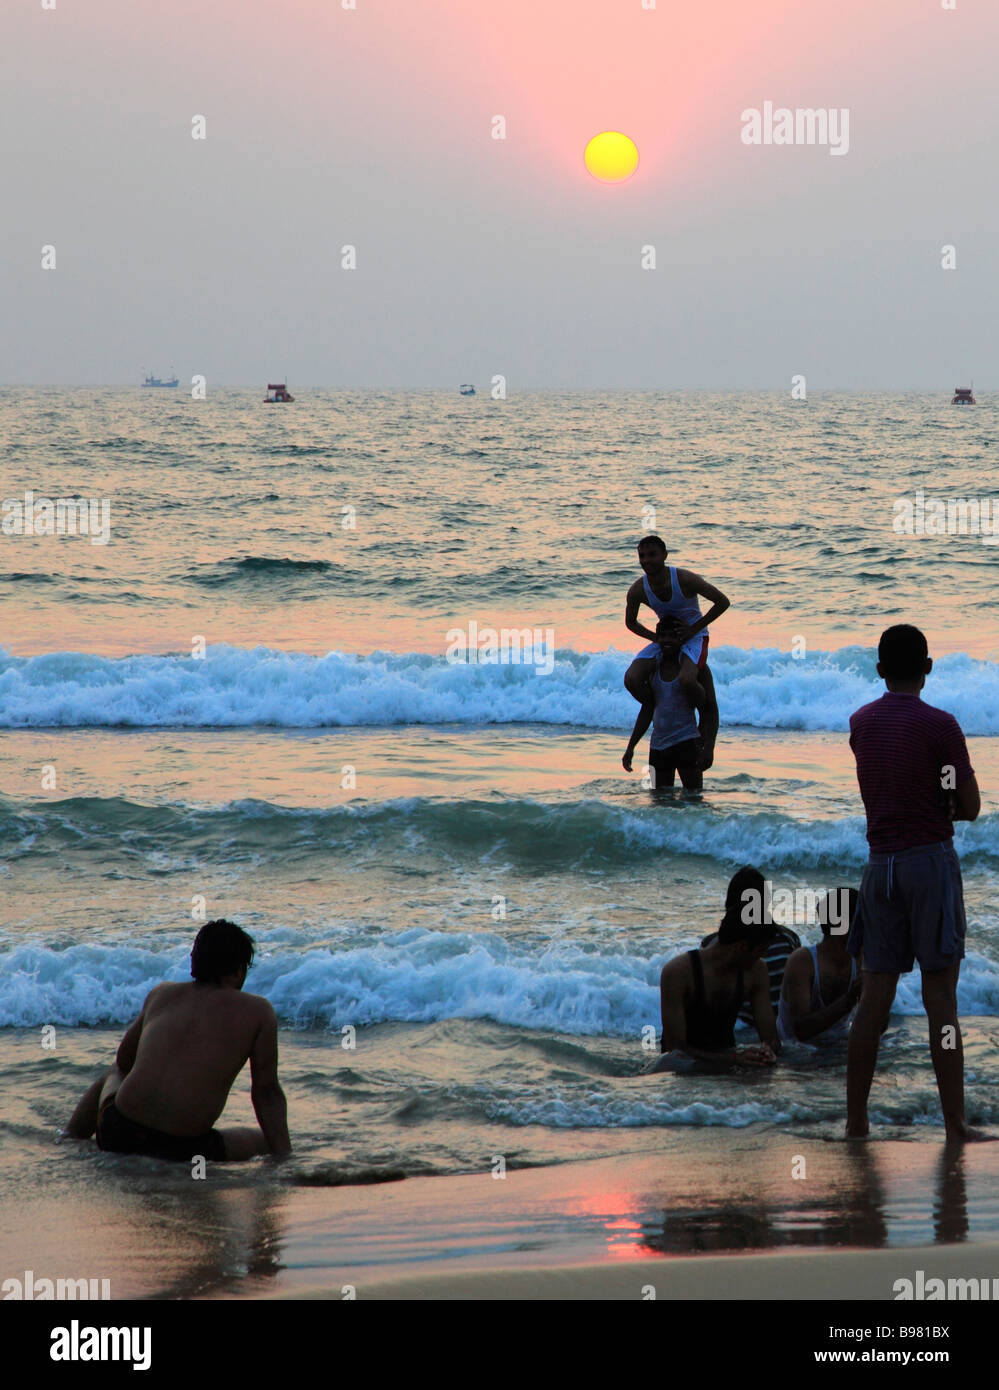 India Goa Colva beach sunset people bathing - Stock Image